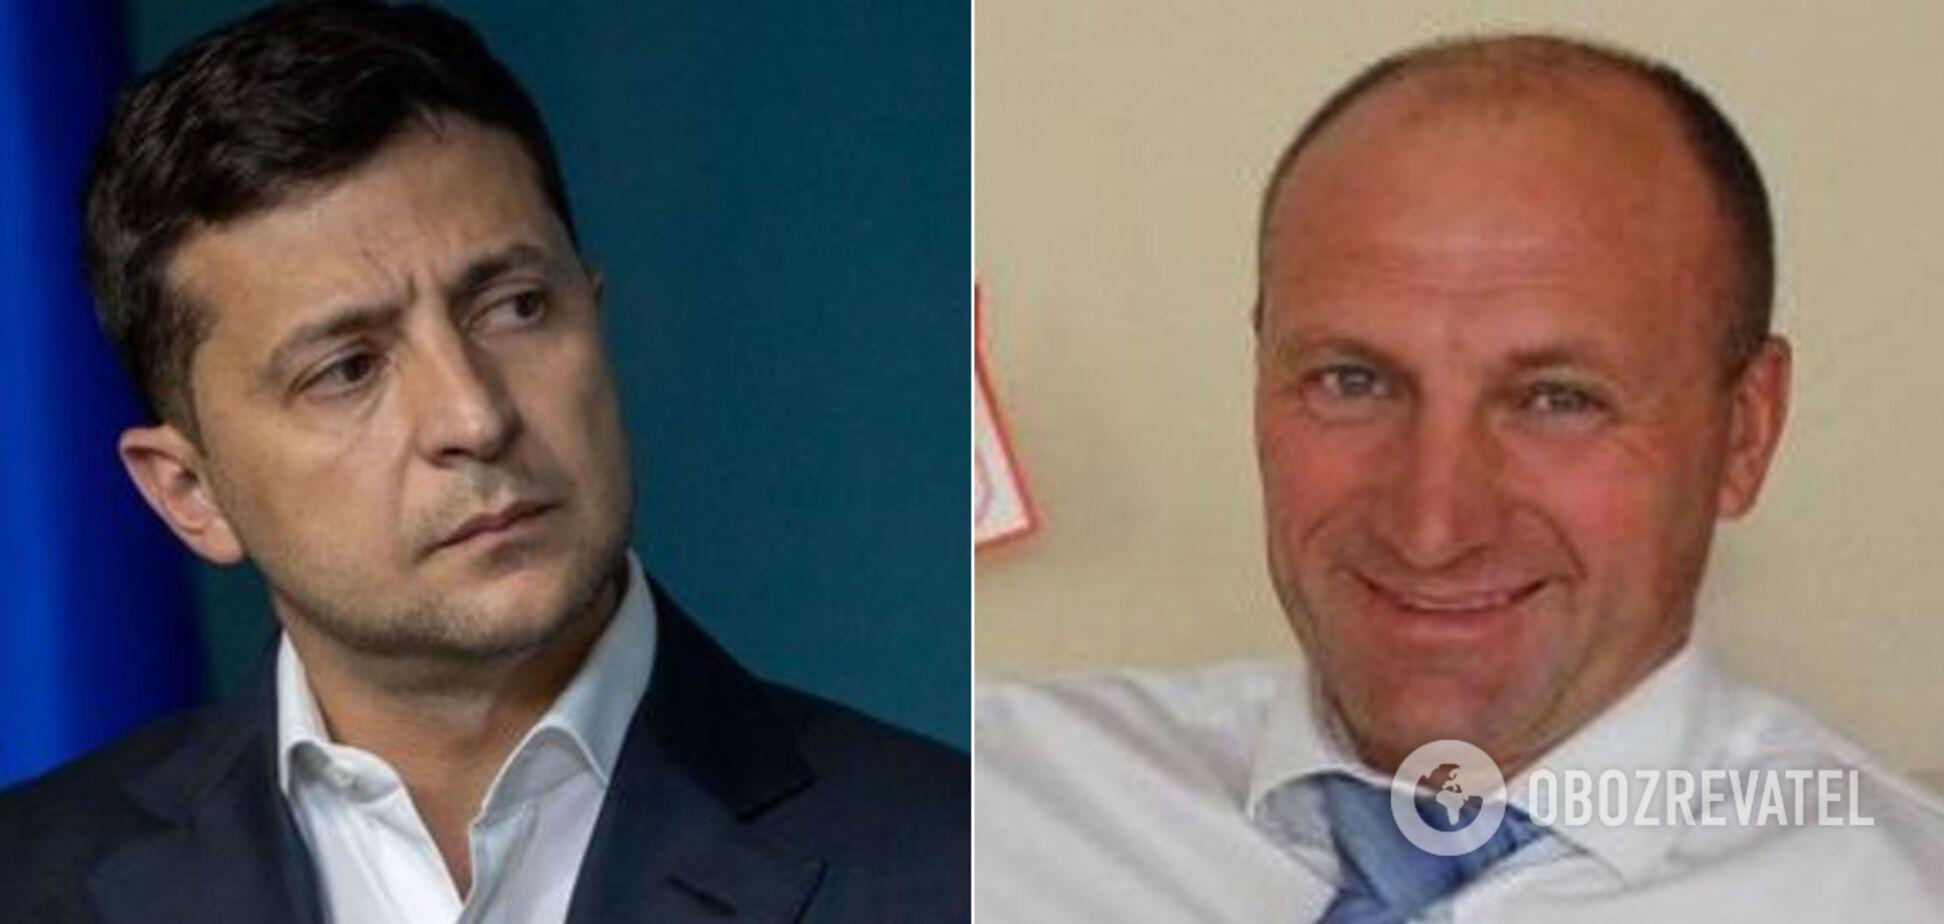 Зеленский назвал мэра Черкасс Бондаренко 'бандитом': тот позвал президента 'на разборки'